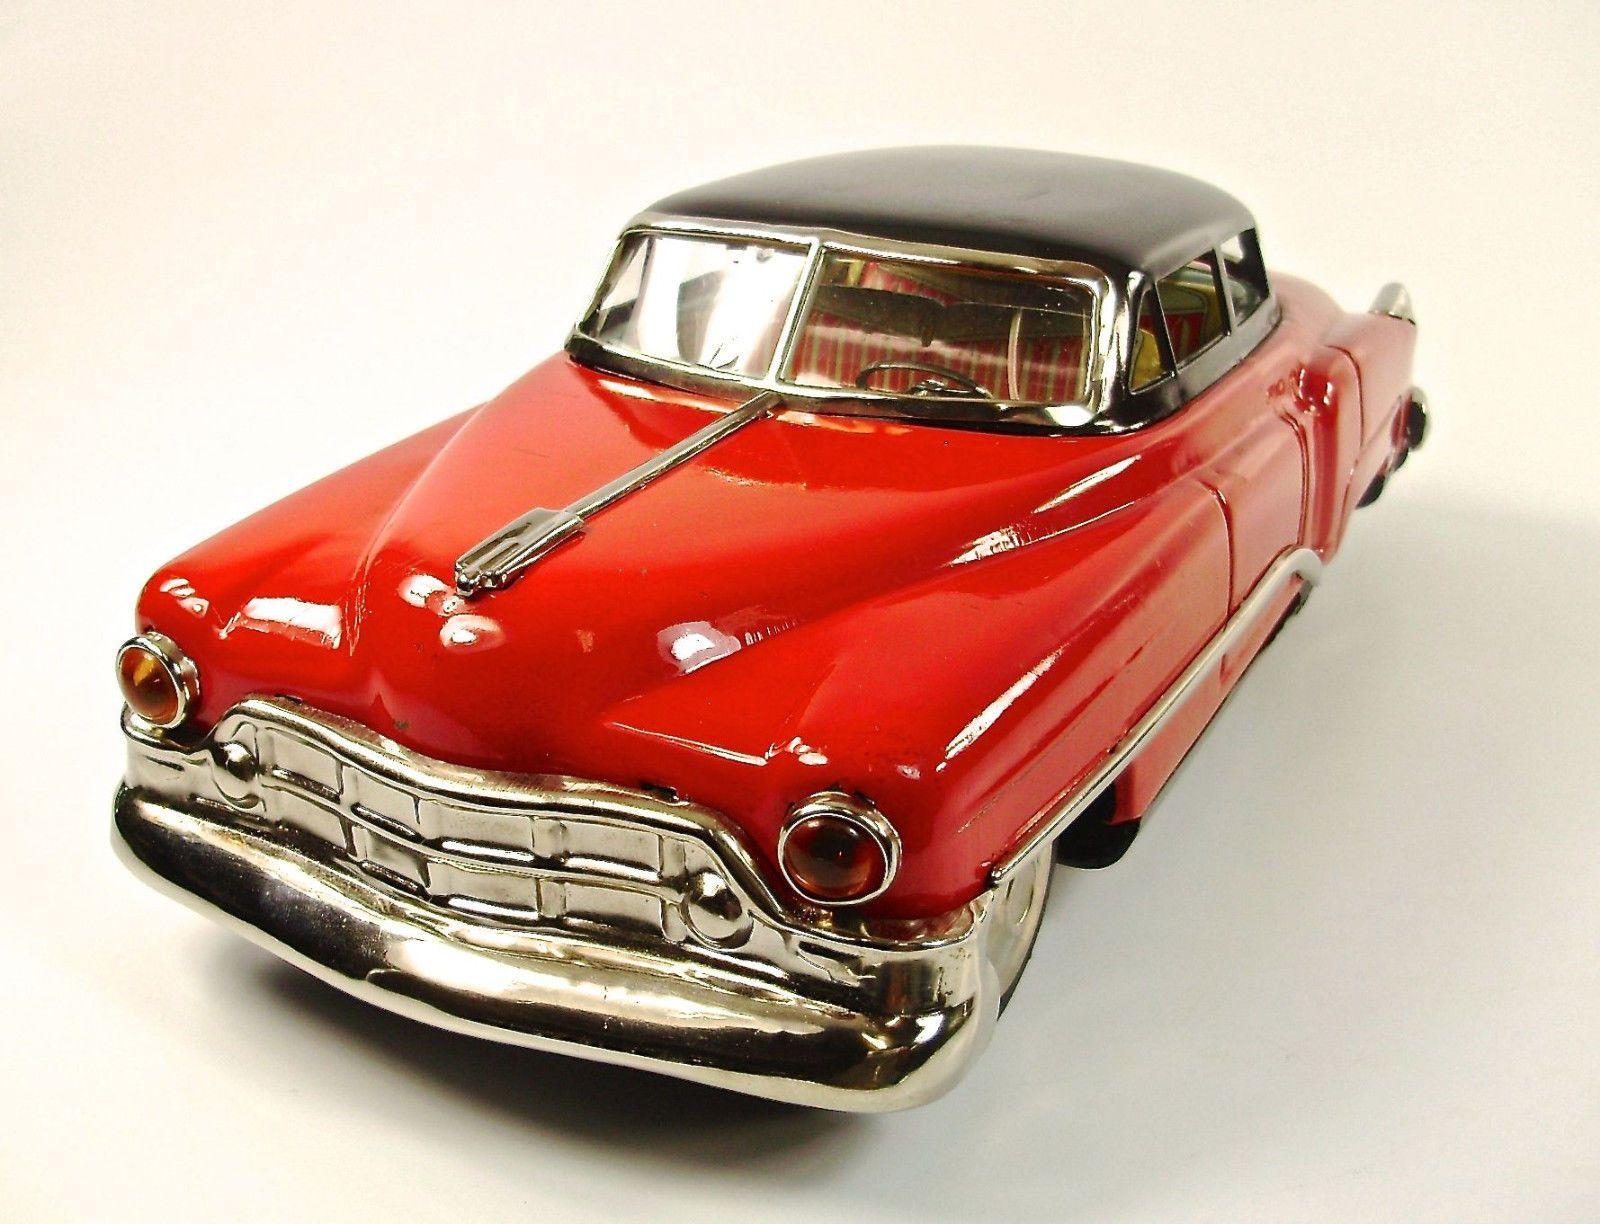 1949 cadillac 4 door sedan 13 5 japanese tin car by tn for 1949 cadillac 4 door sedan